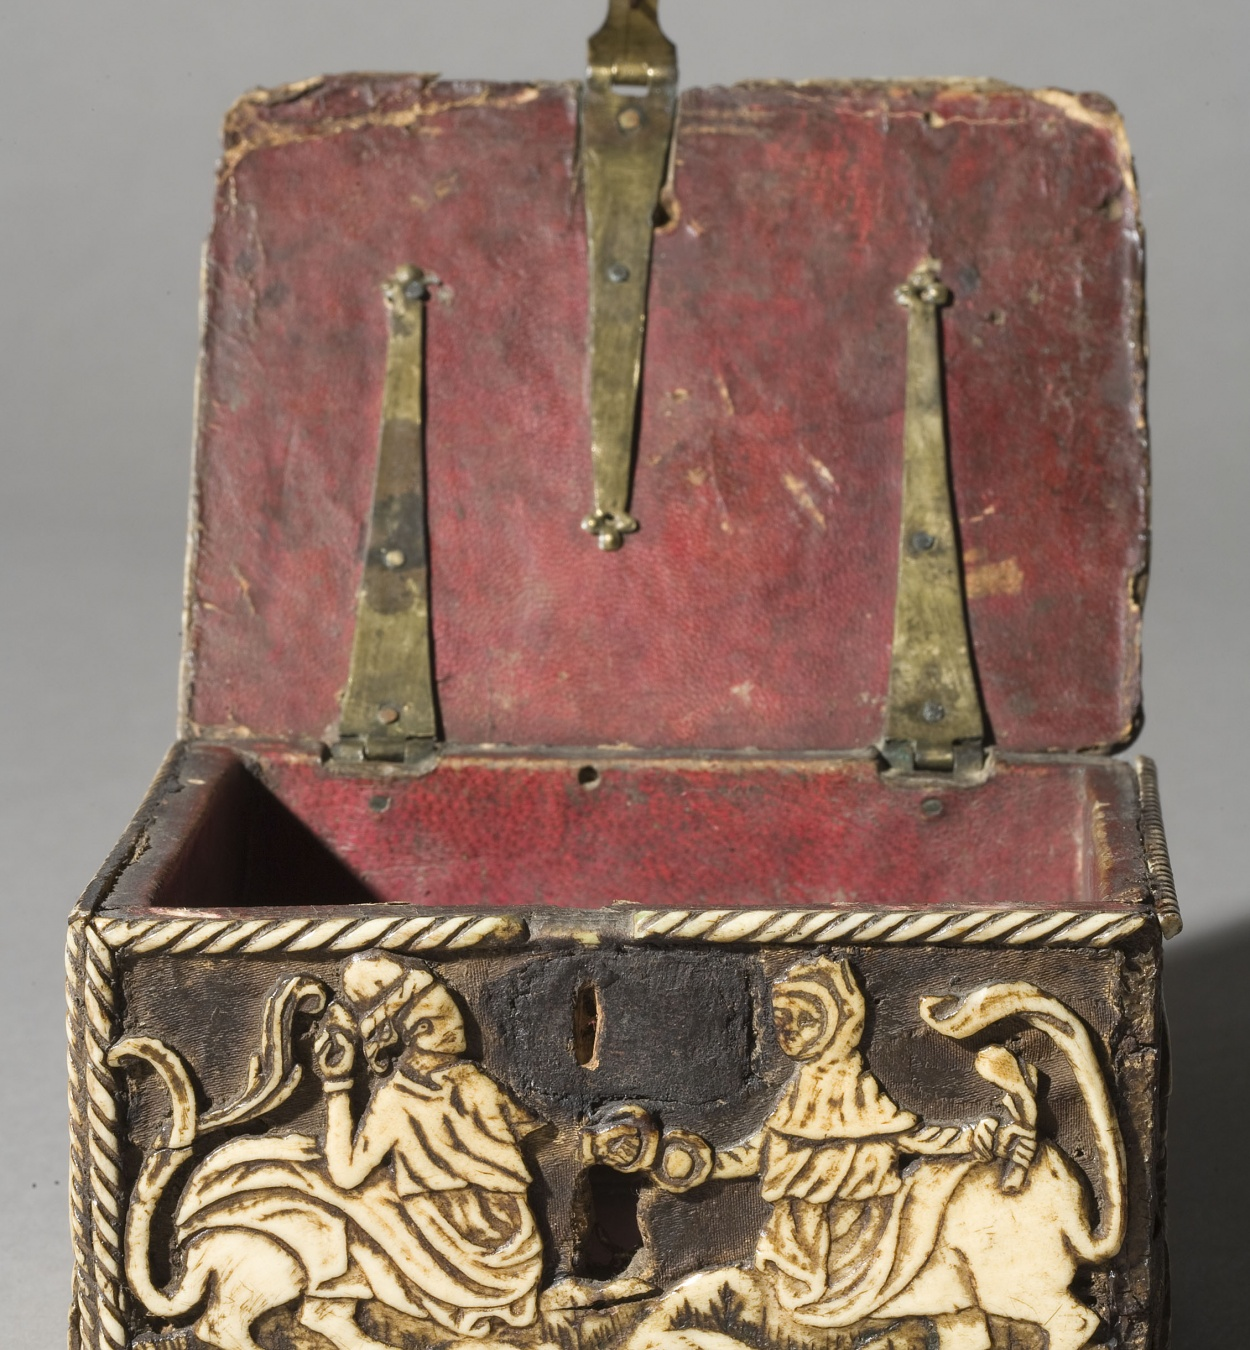 Anònim. França - Capseta amatòria amb dama i unicorn - Segle XV [9]